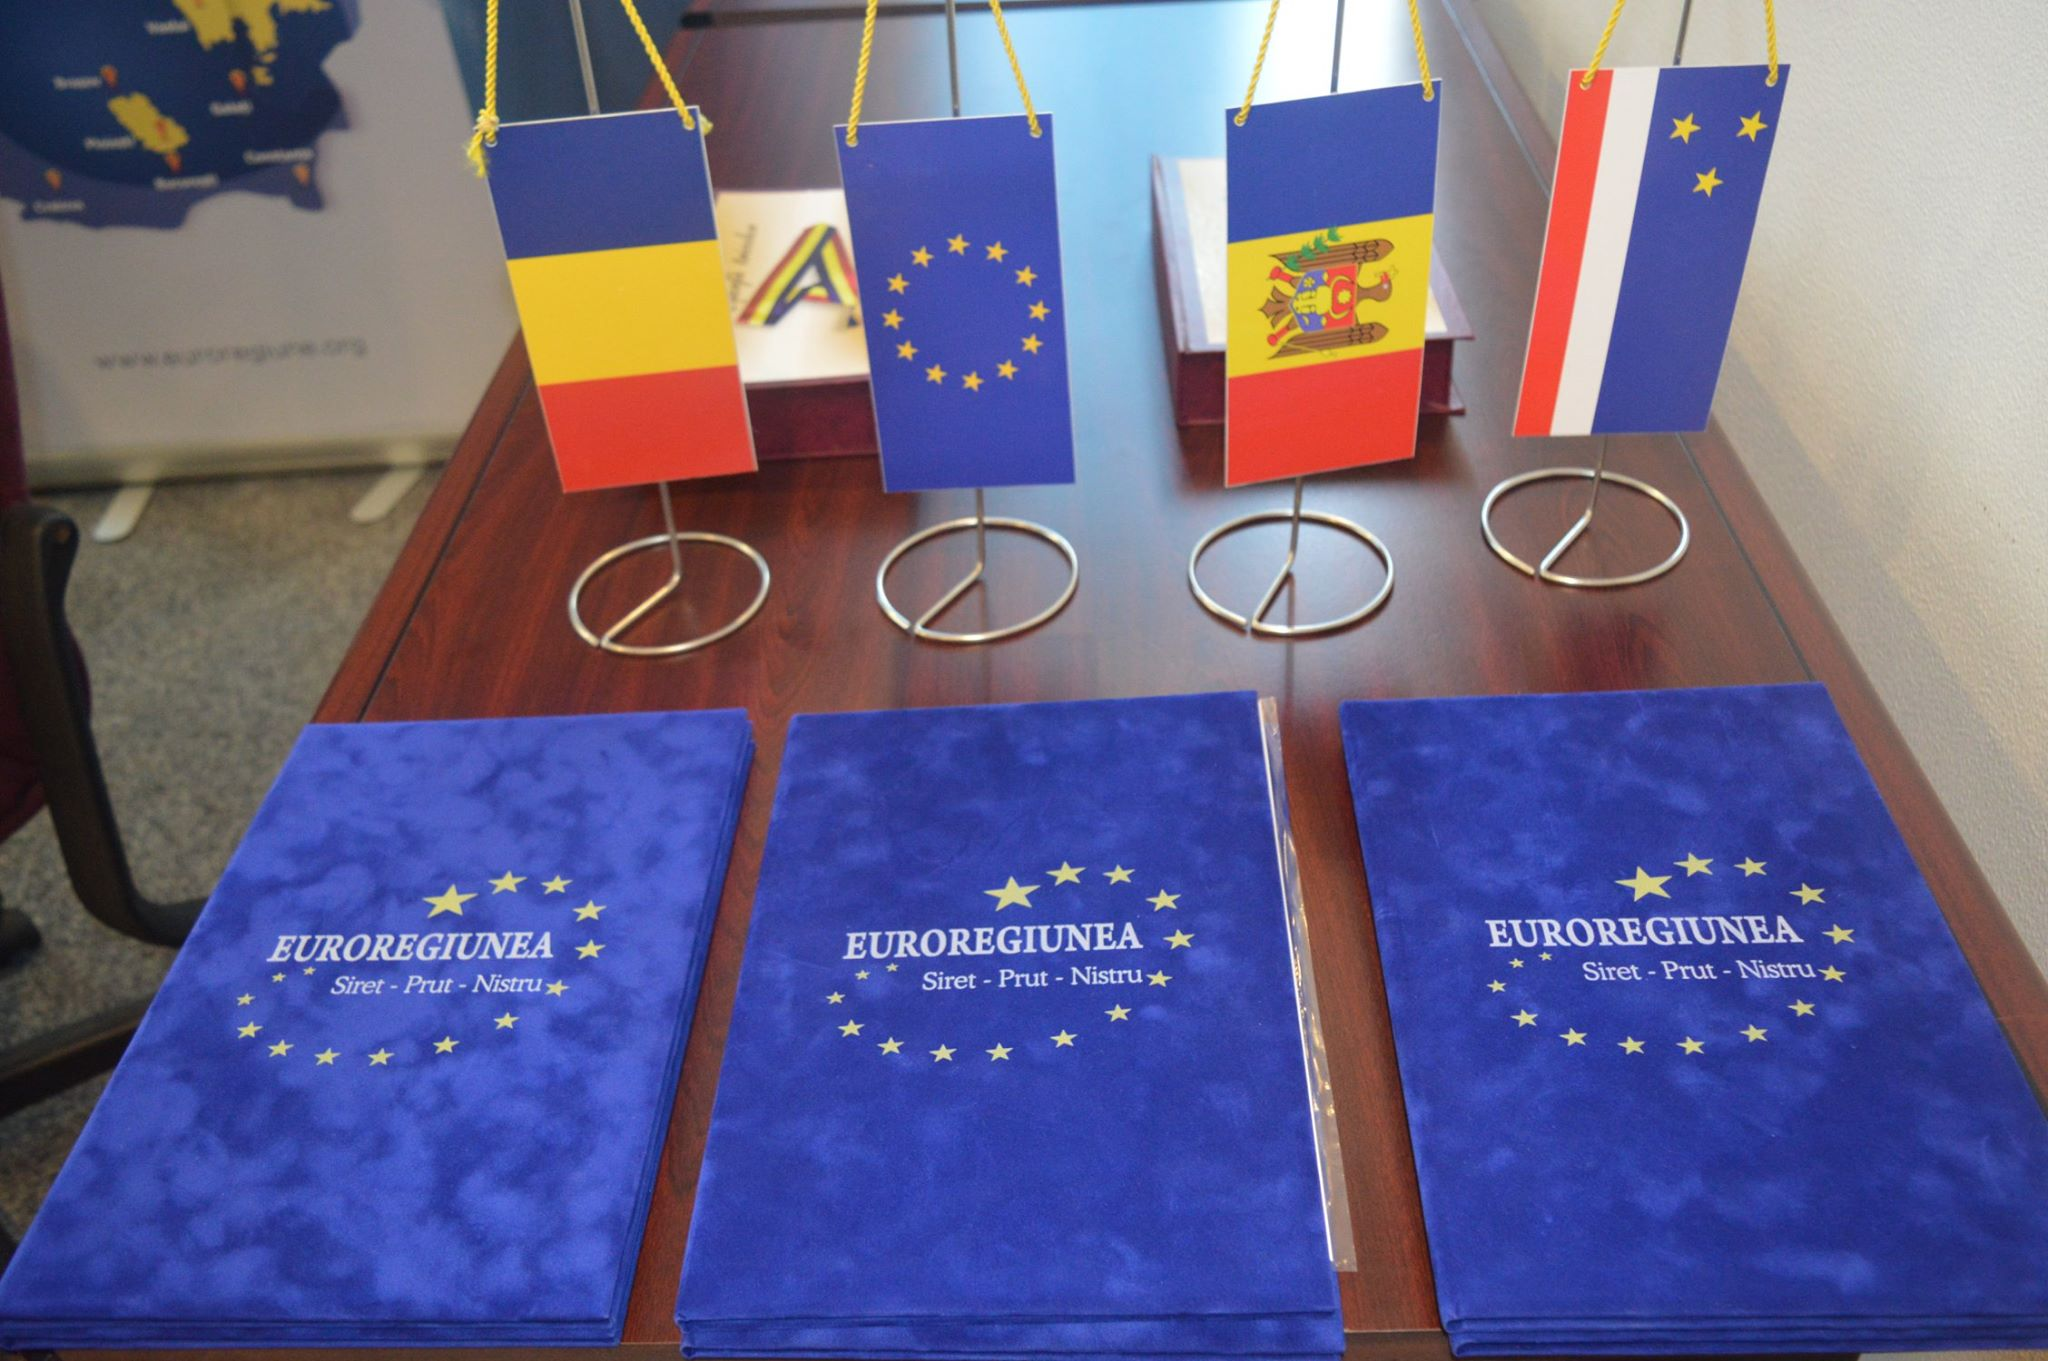 "<a class=""amazingslider-posttitle-link"" href=""https://www.euroregiune.org/21-22-iulie-slanic-moldova/"" target=""_self"">21-22 iulie - Slănic Moldova</a>"